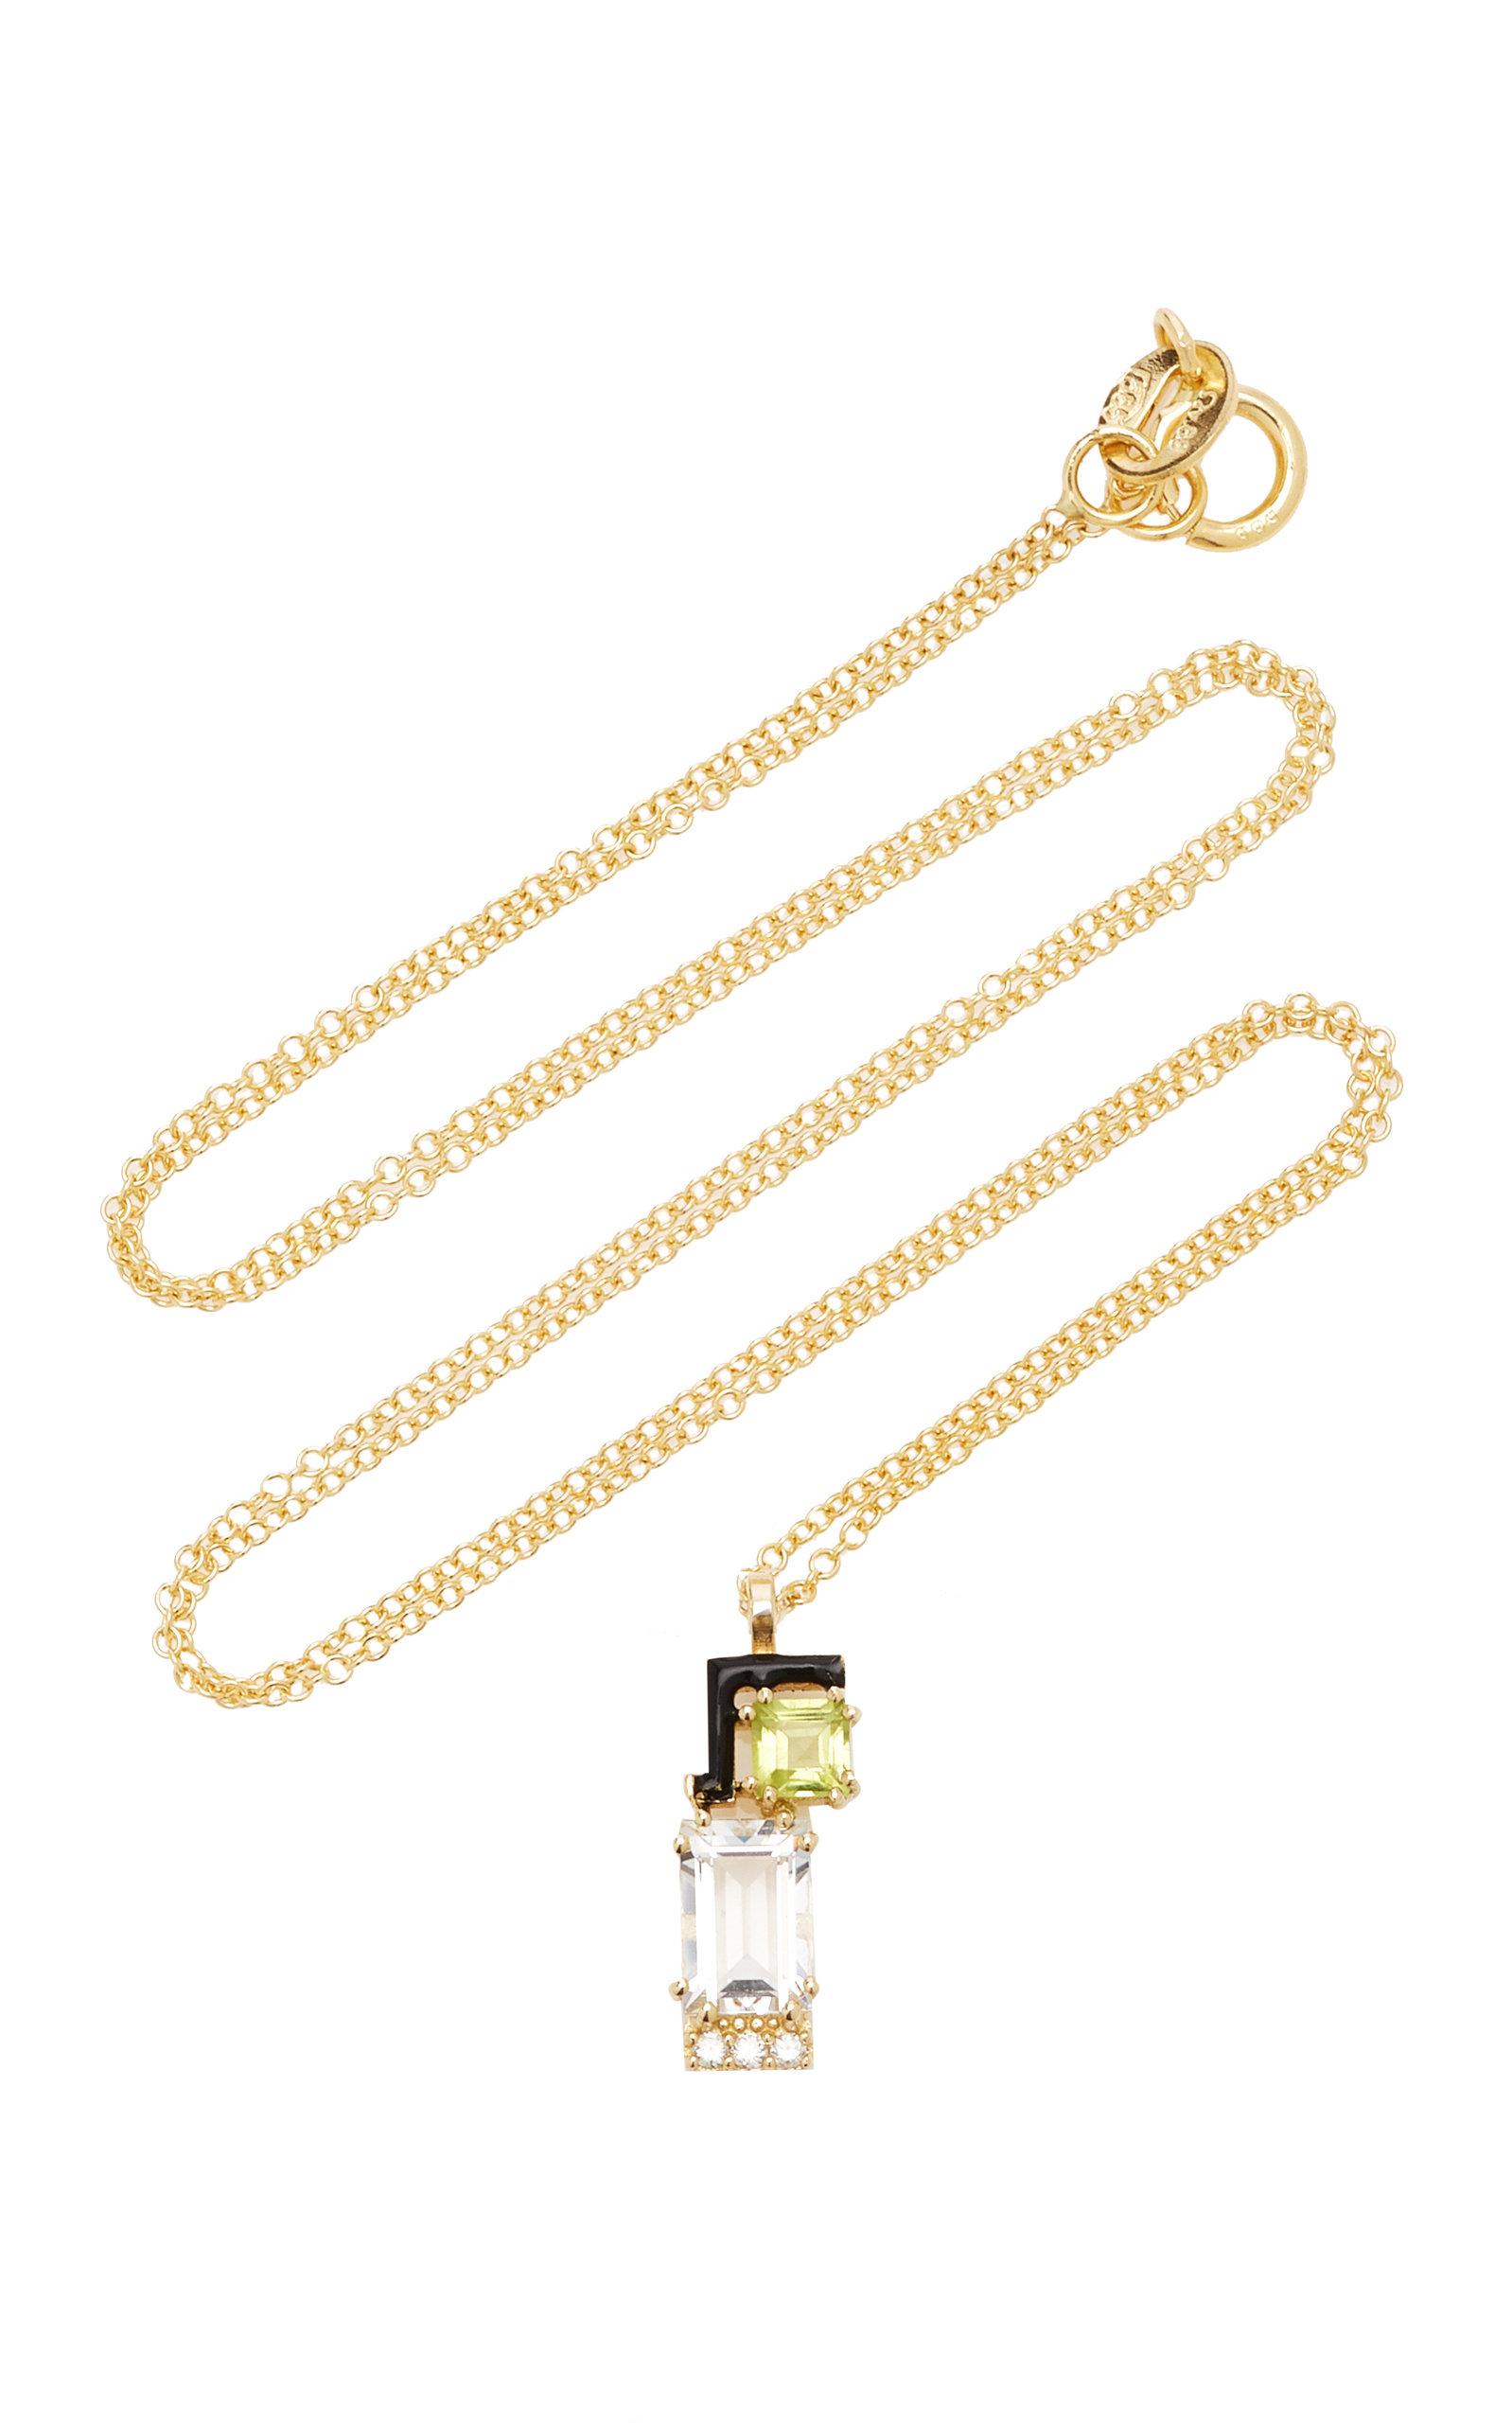 Women's Jolly 14K Yellow Gold Multi-Stone Necklace